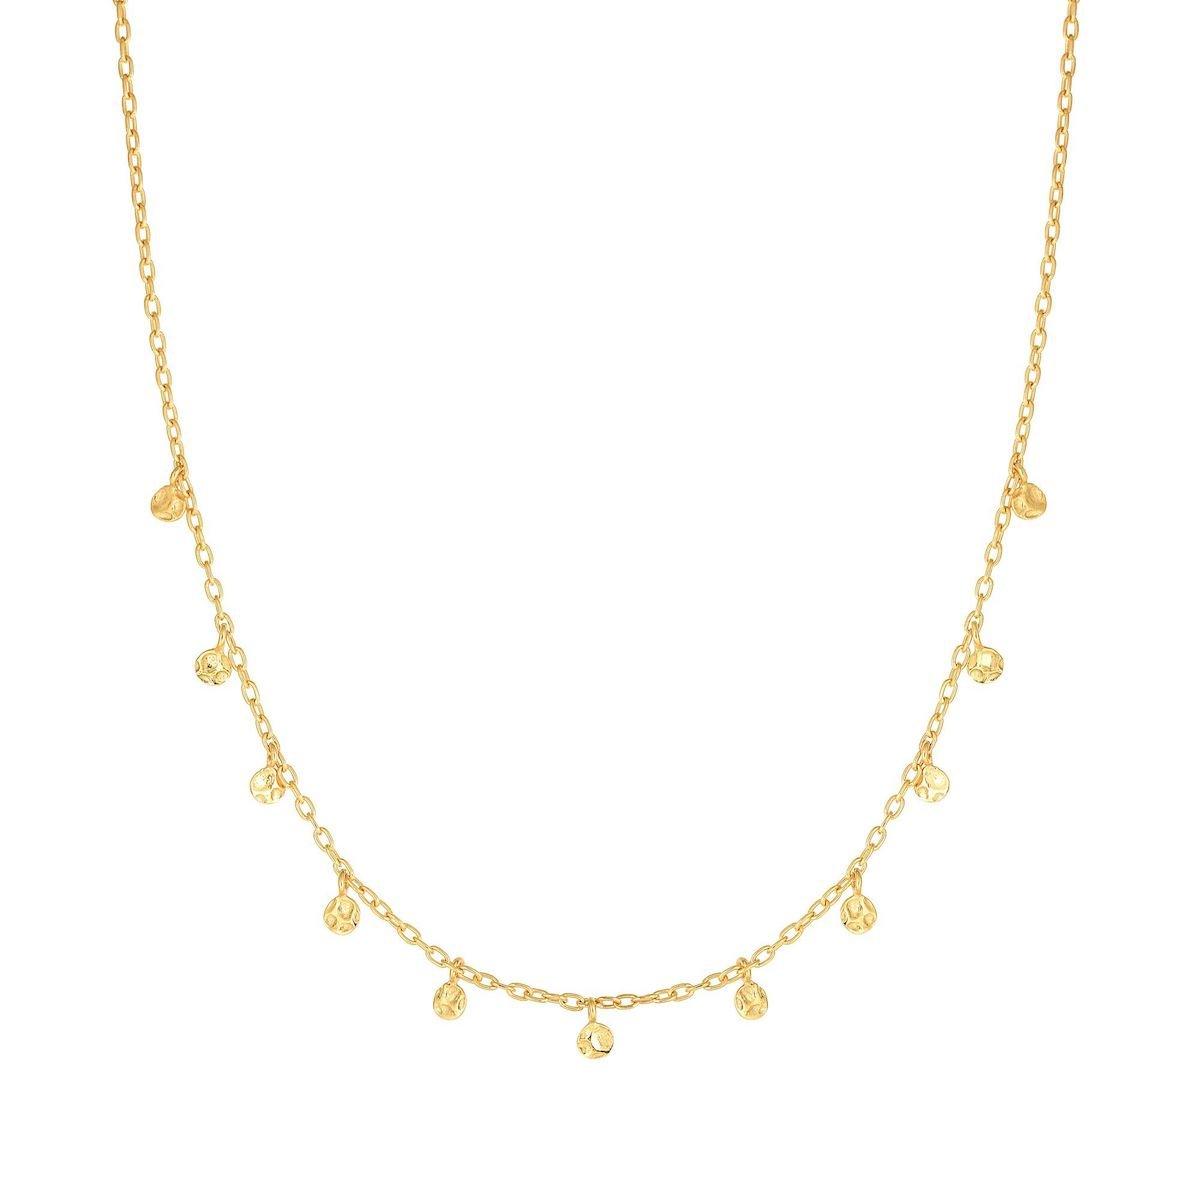 Amanda Rose Fancy Choker Necklace in 14k Yellow Gold (16 inch)